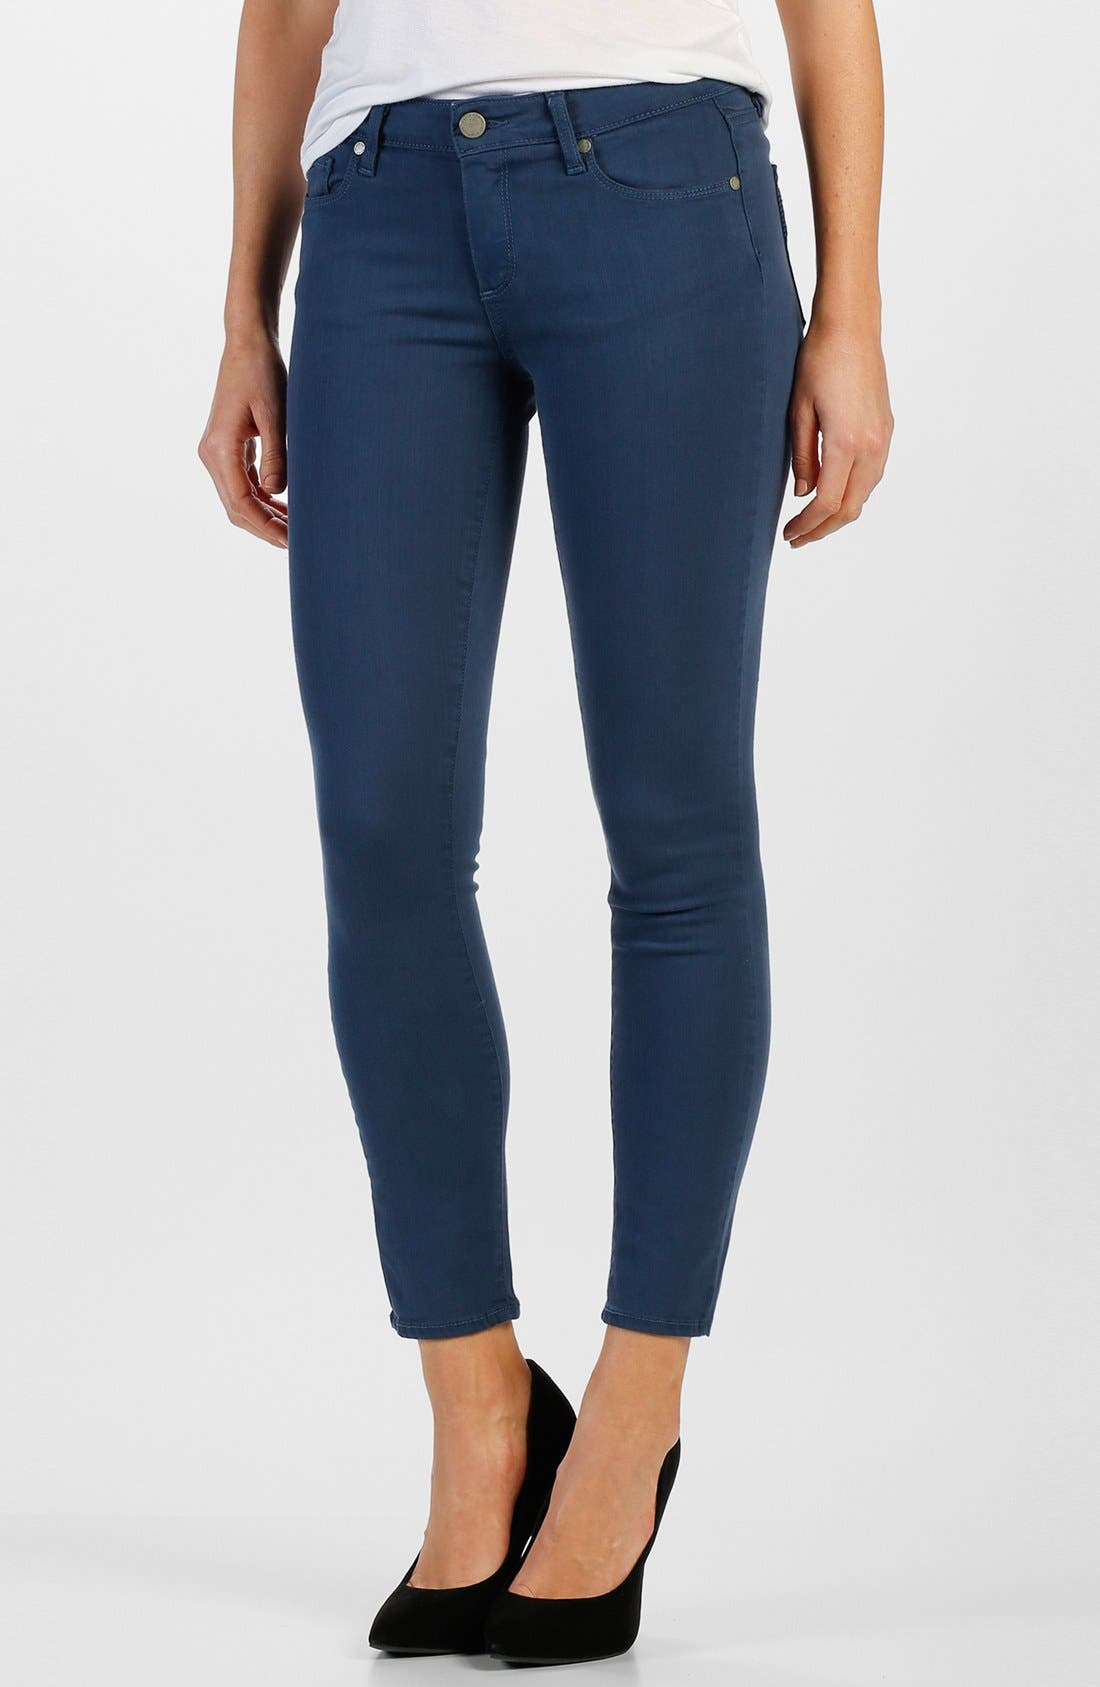 Main Image - Paige Denim 'Verdugo' Ankle Ultra Skinny Jeans (Cornflower Blue)